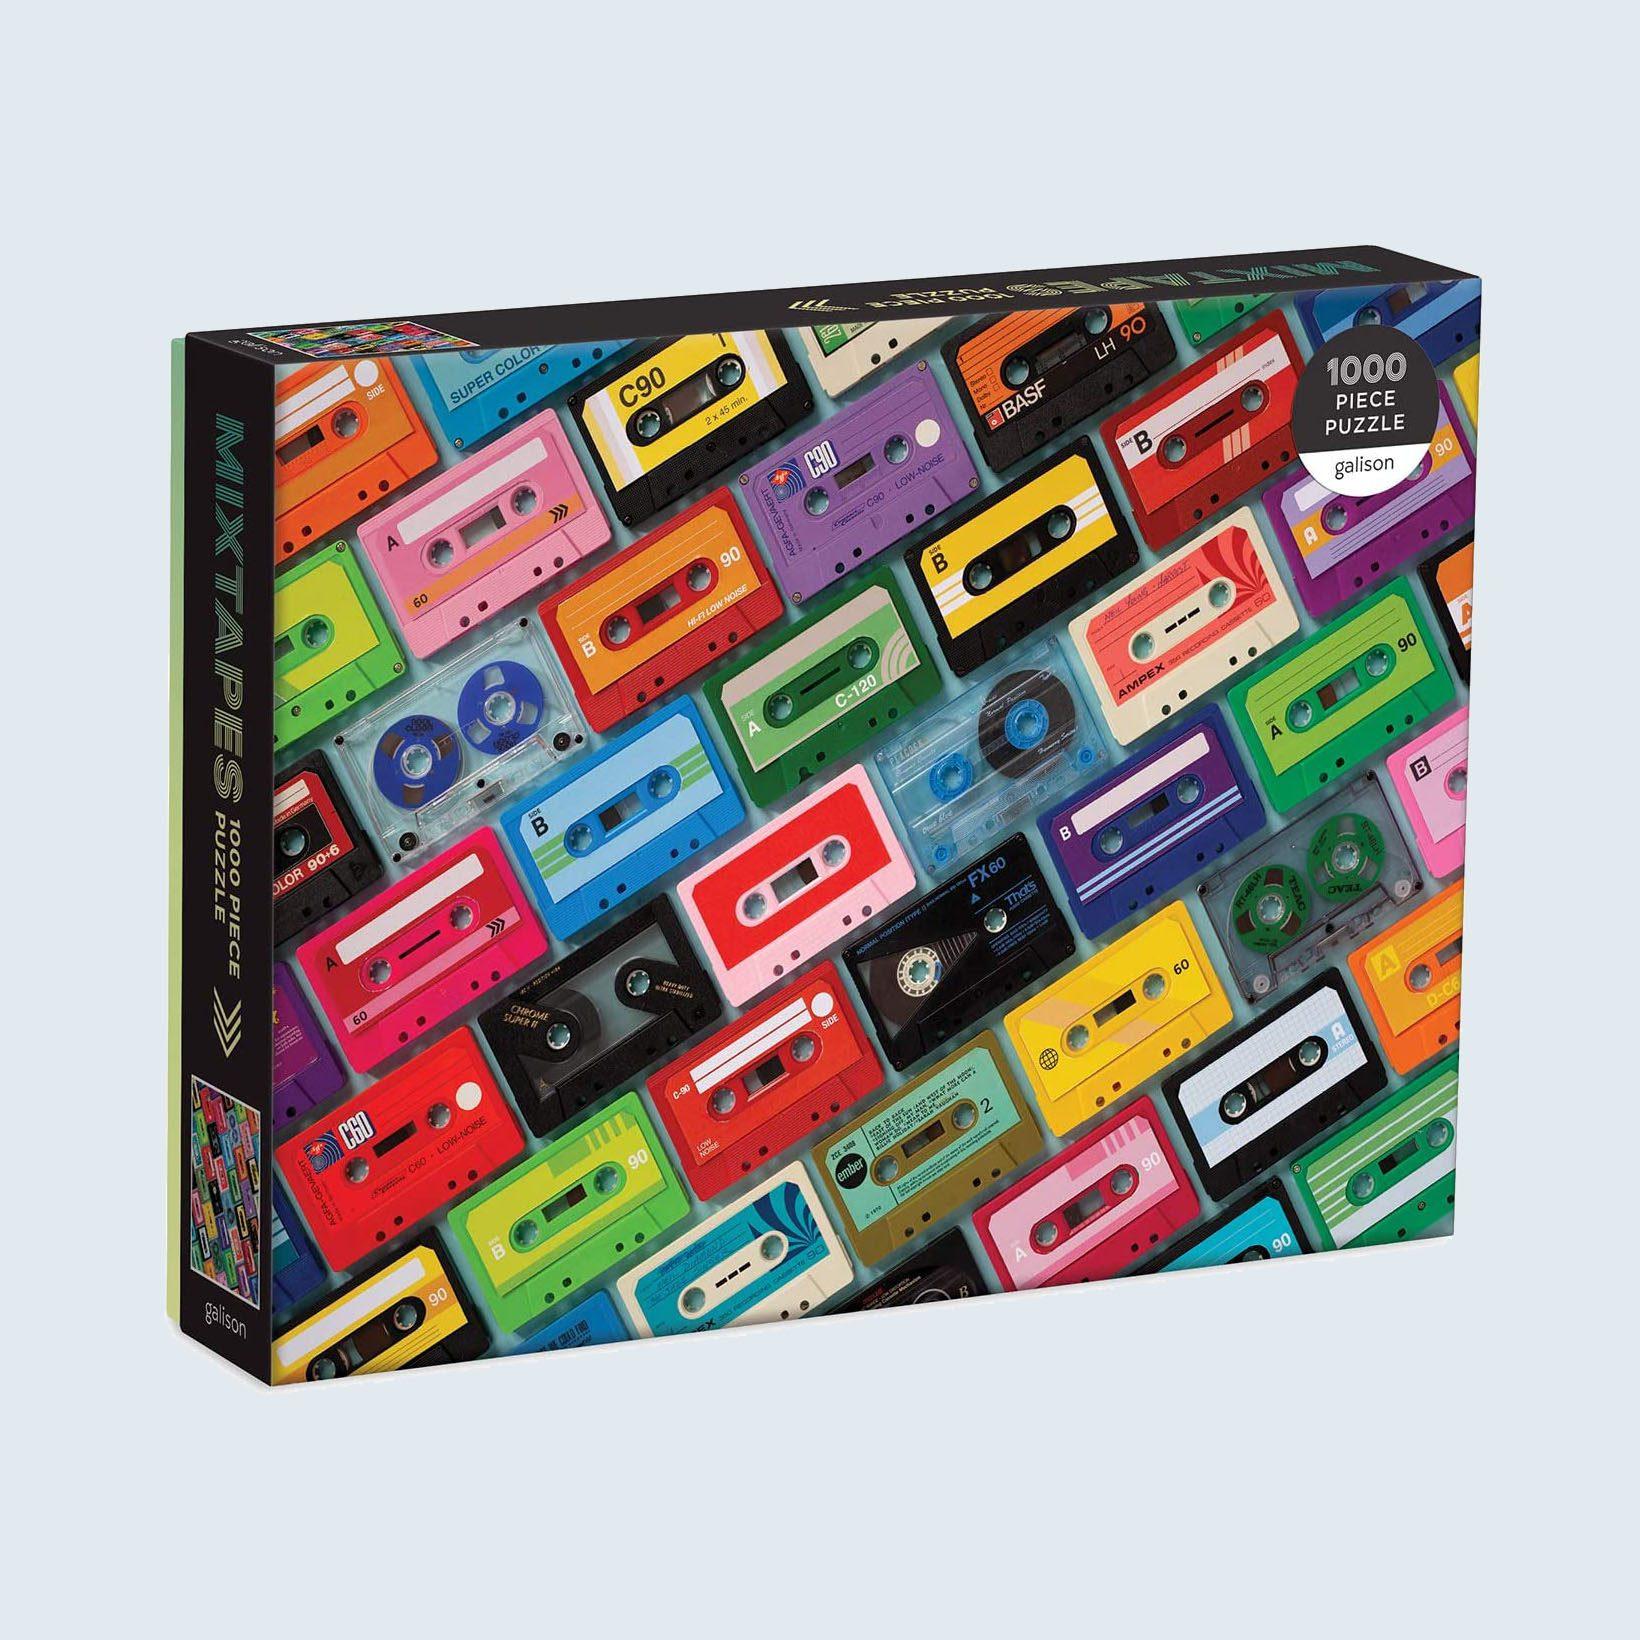 Galison Mixtapes 1,000 Piece Puzzle